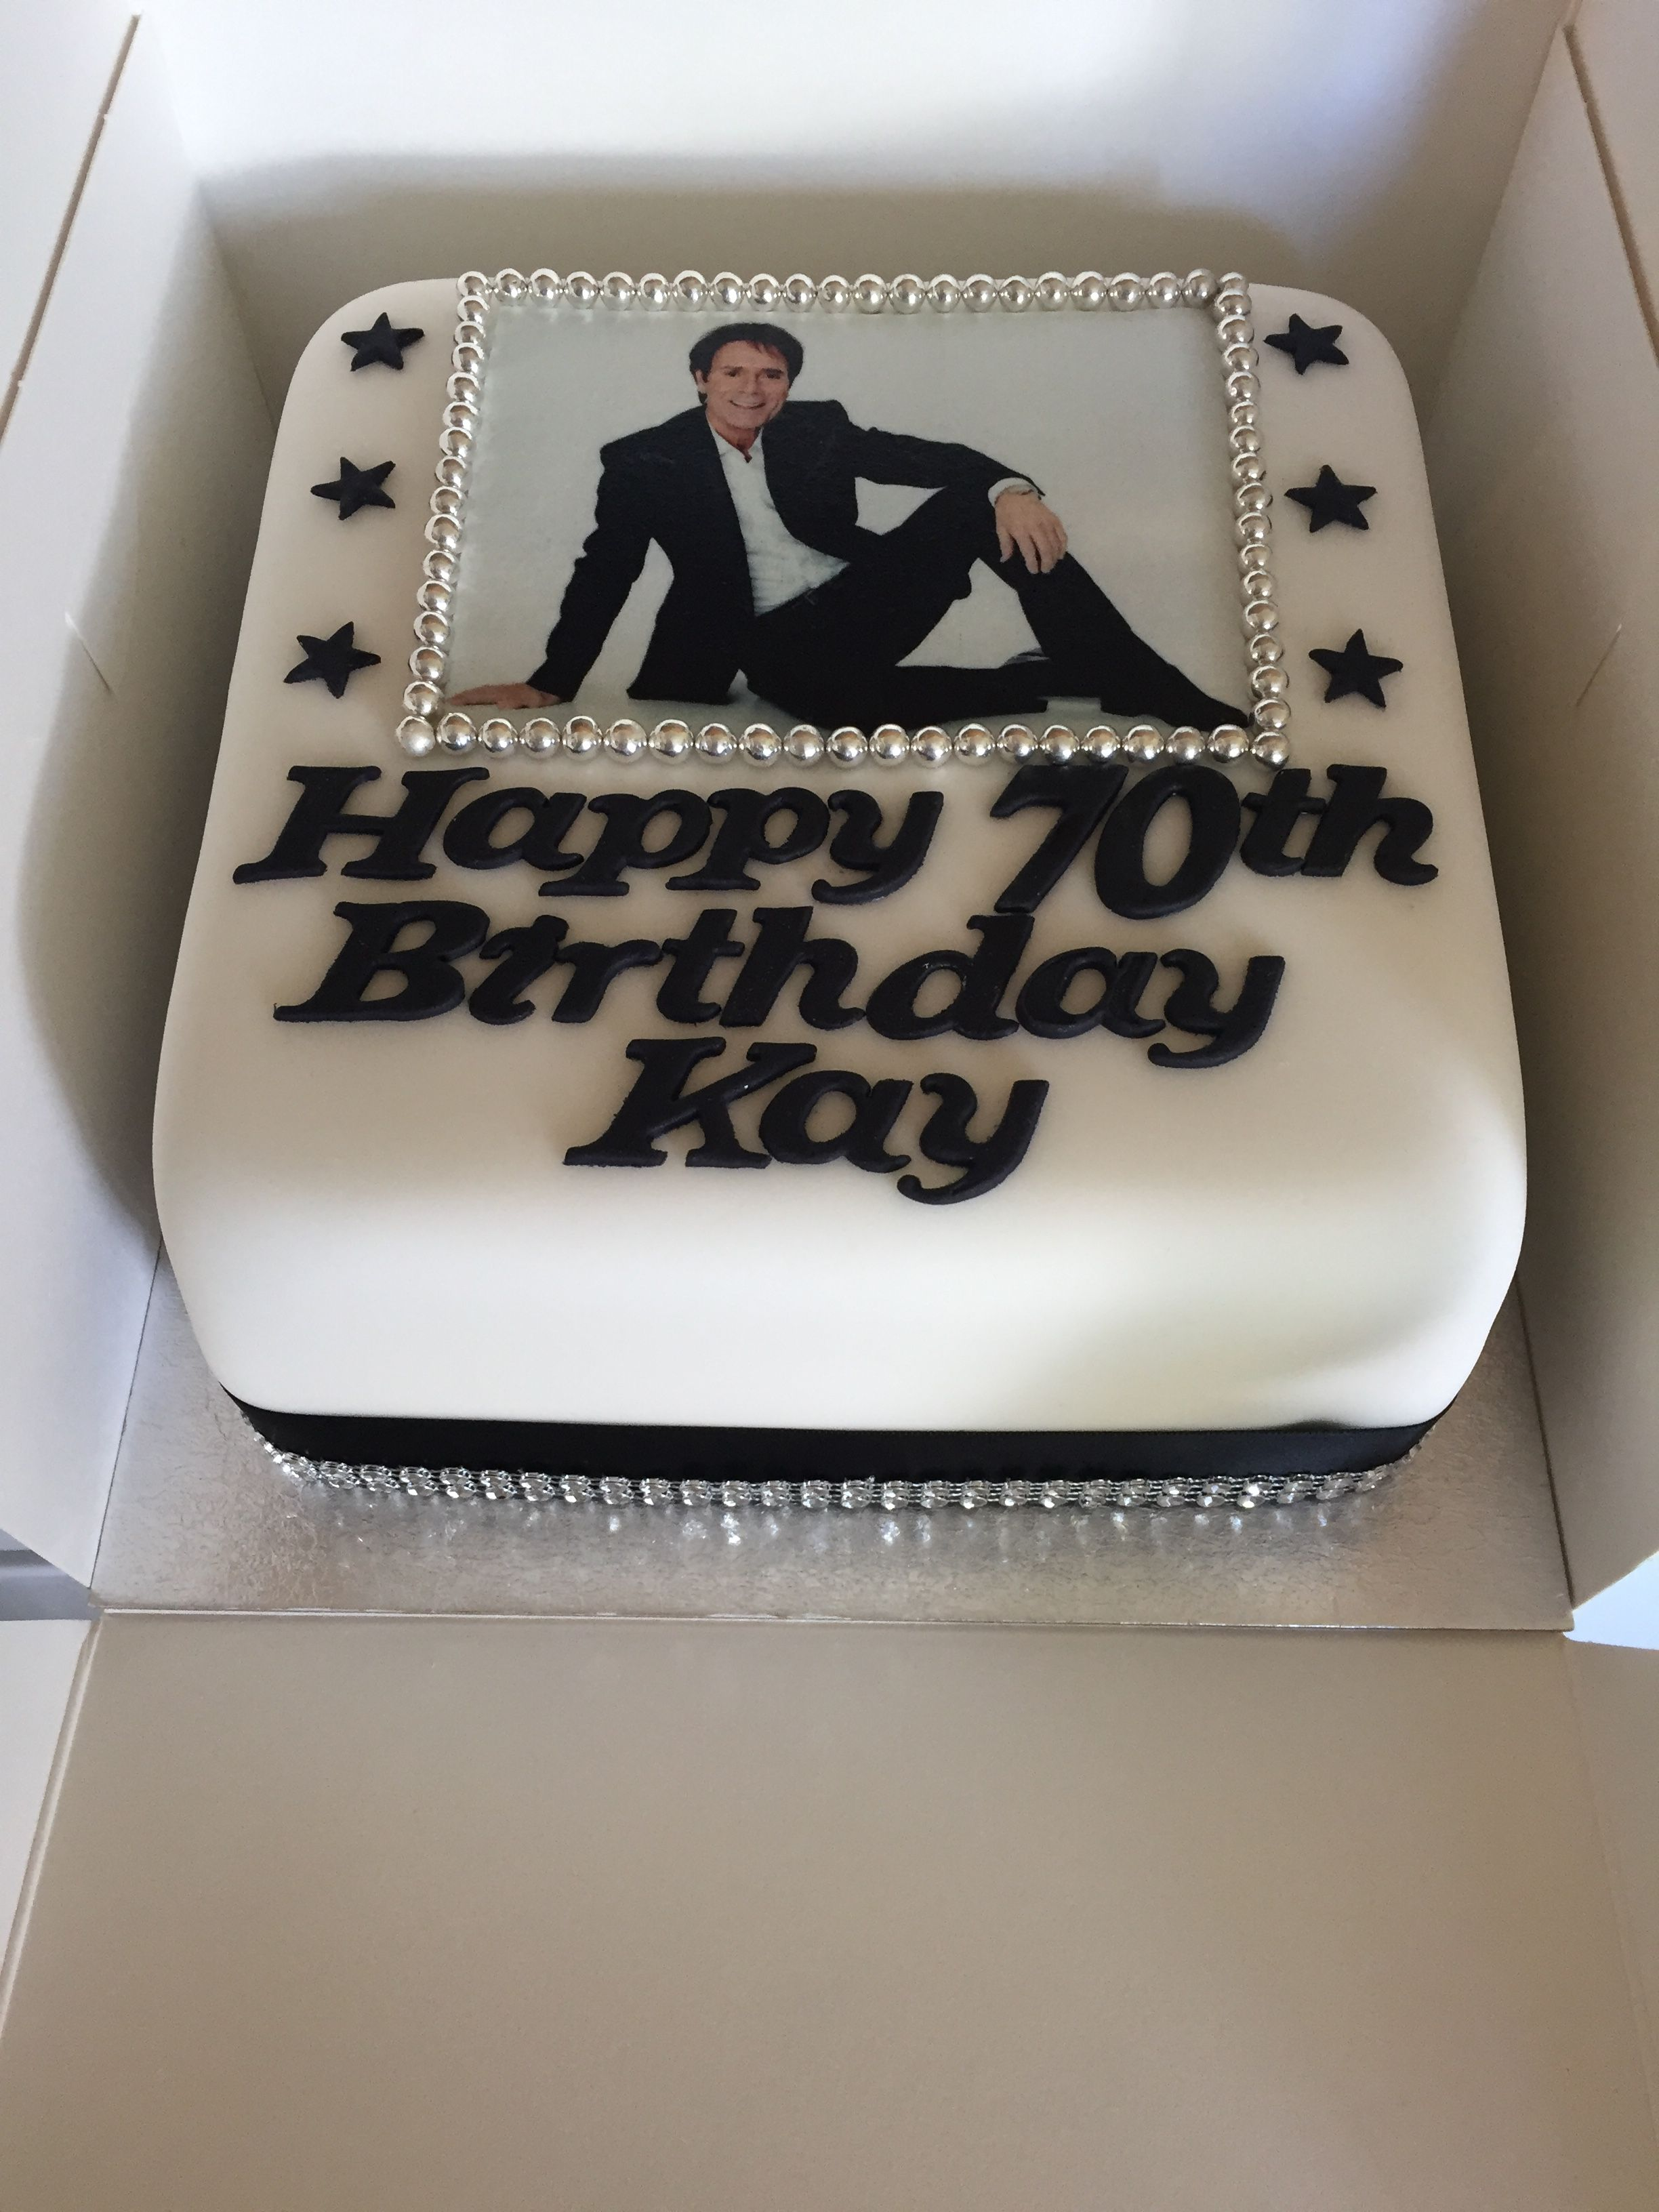 Cliff Richard Cake Cake Cake Inspiration Desserts